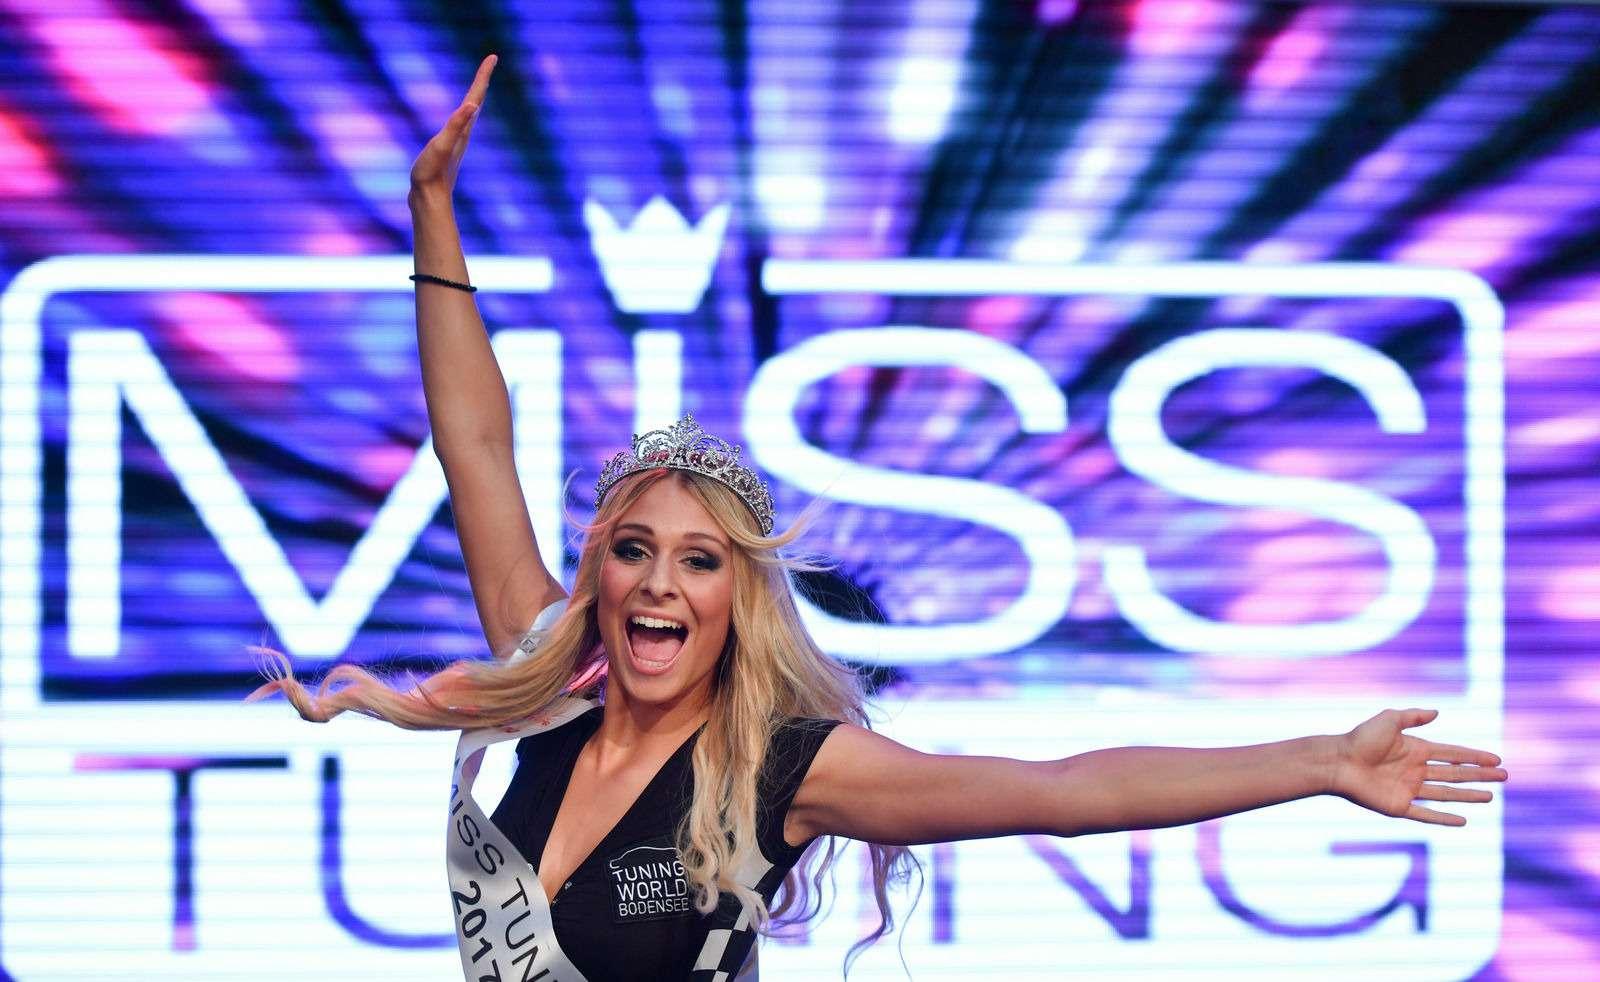 Miss Tuning 2017: фотогалерея финалисток ипобедительницы— фото 746698